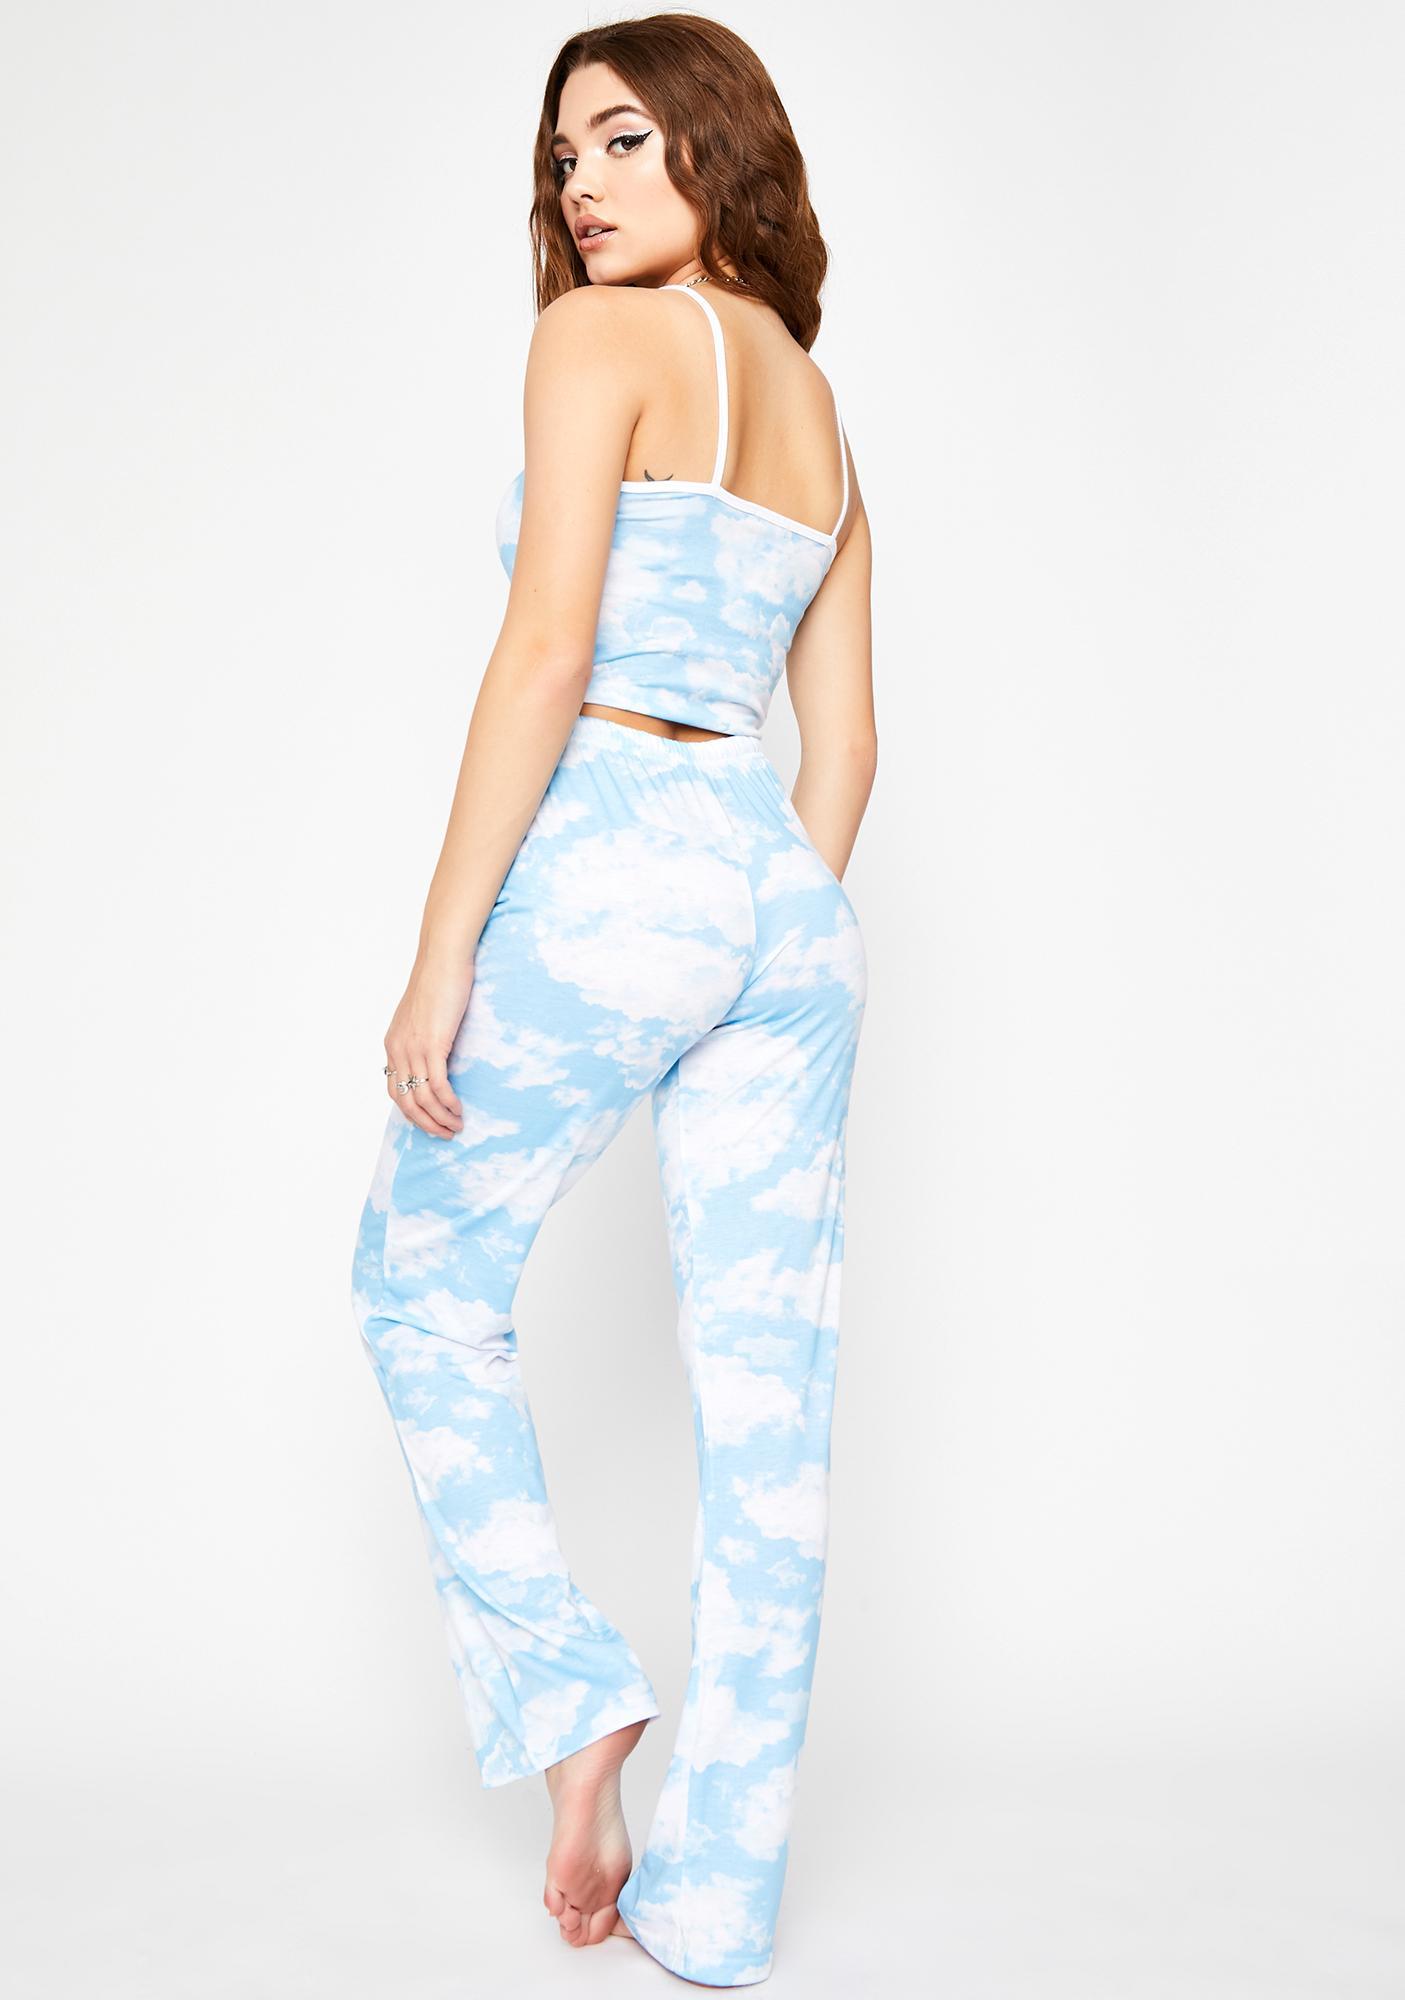 HOROSCOPEZ Caught Daydreaming Pajama Pants